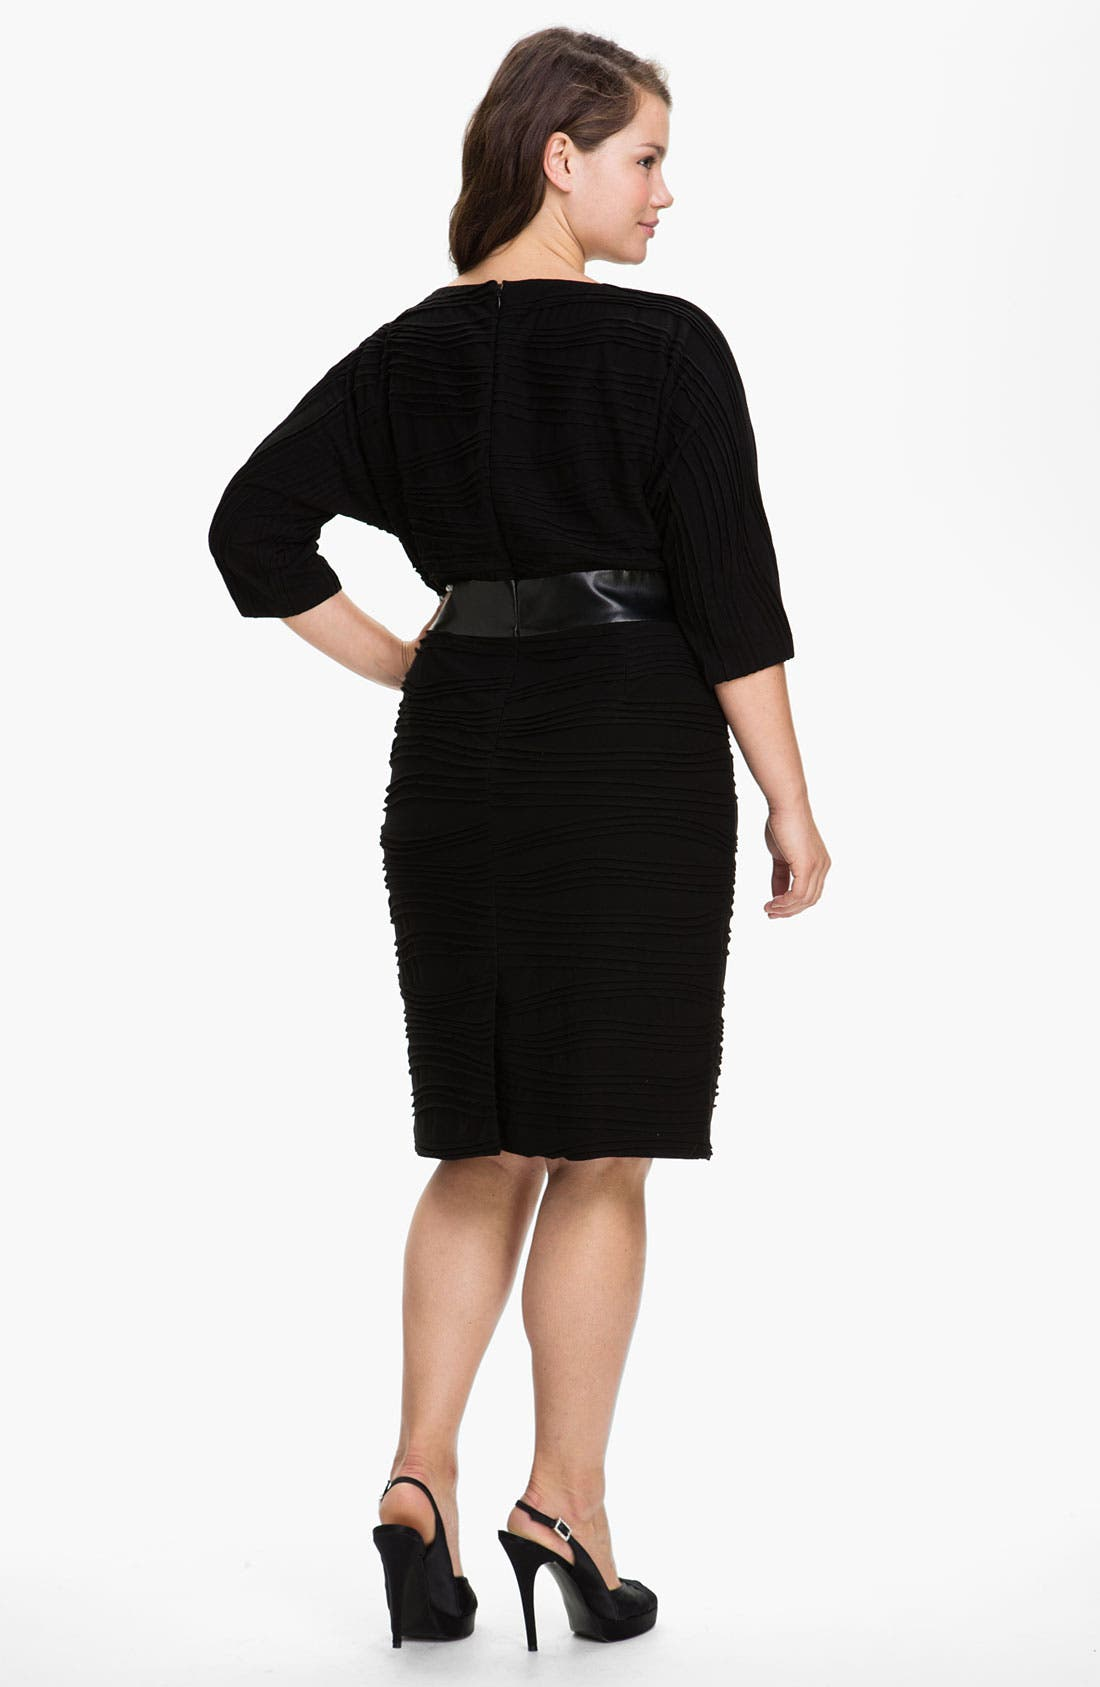 Alternate Image 2  - Adrianna Papell Faux Leather Trim Jersey Sheath Dress (Plus)